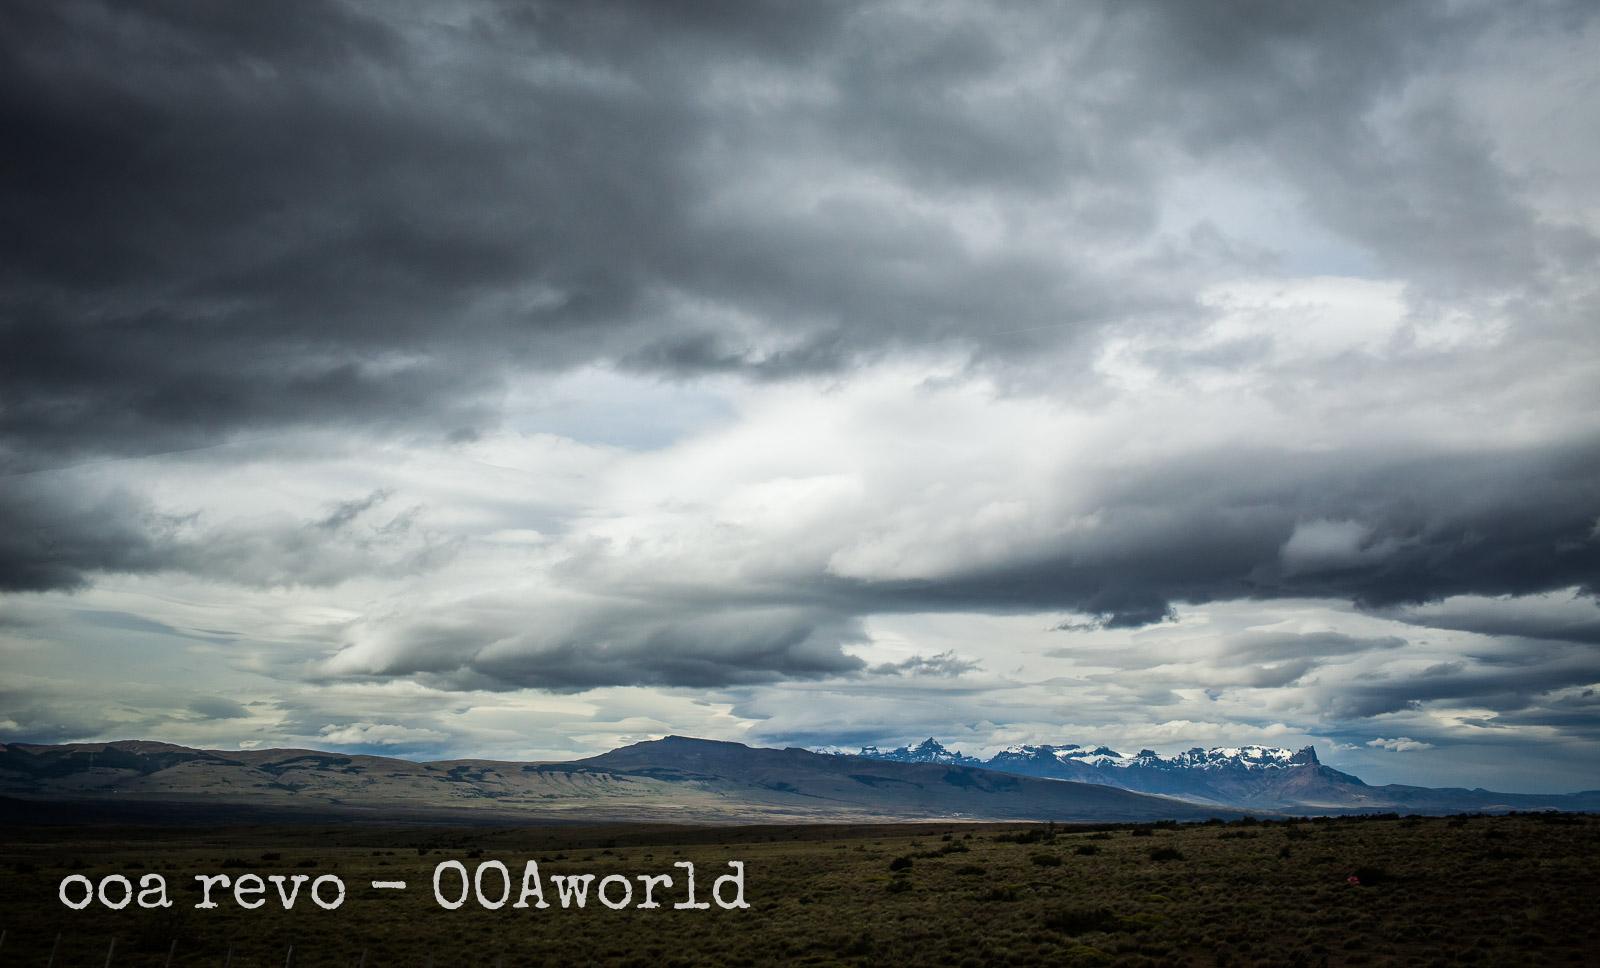 Torres del Paine W Trek Sky Clouds Photo Ooaworld